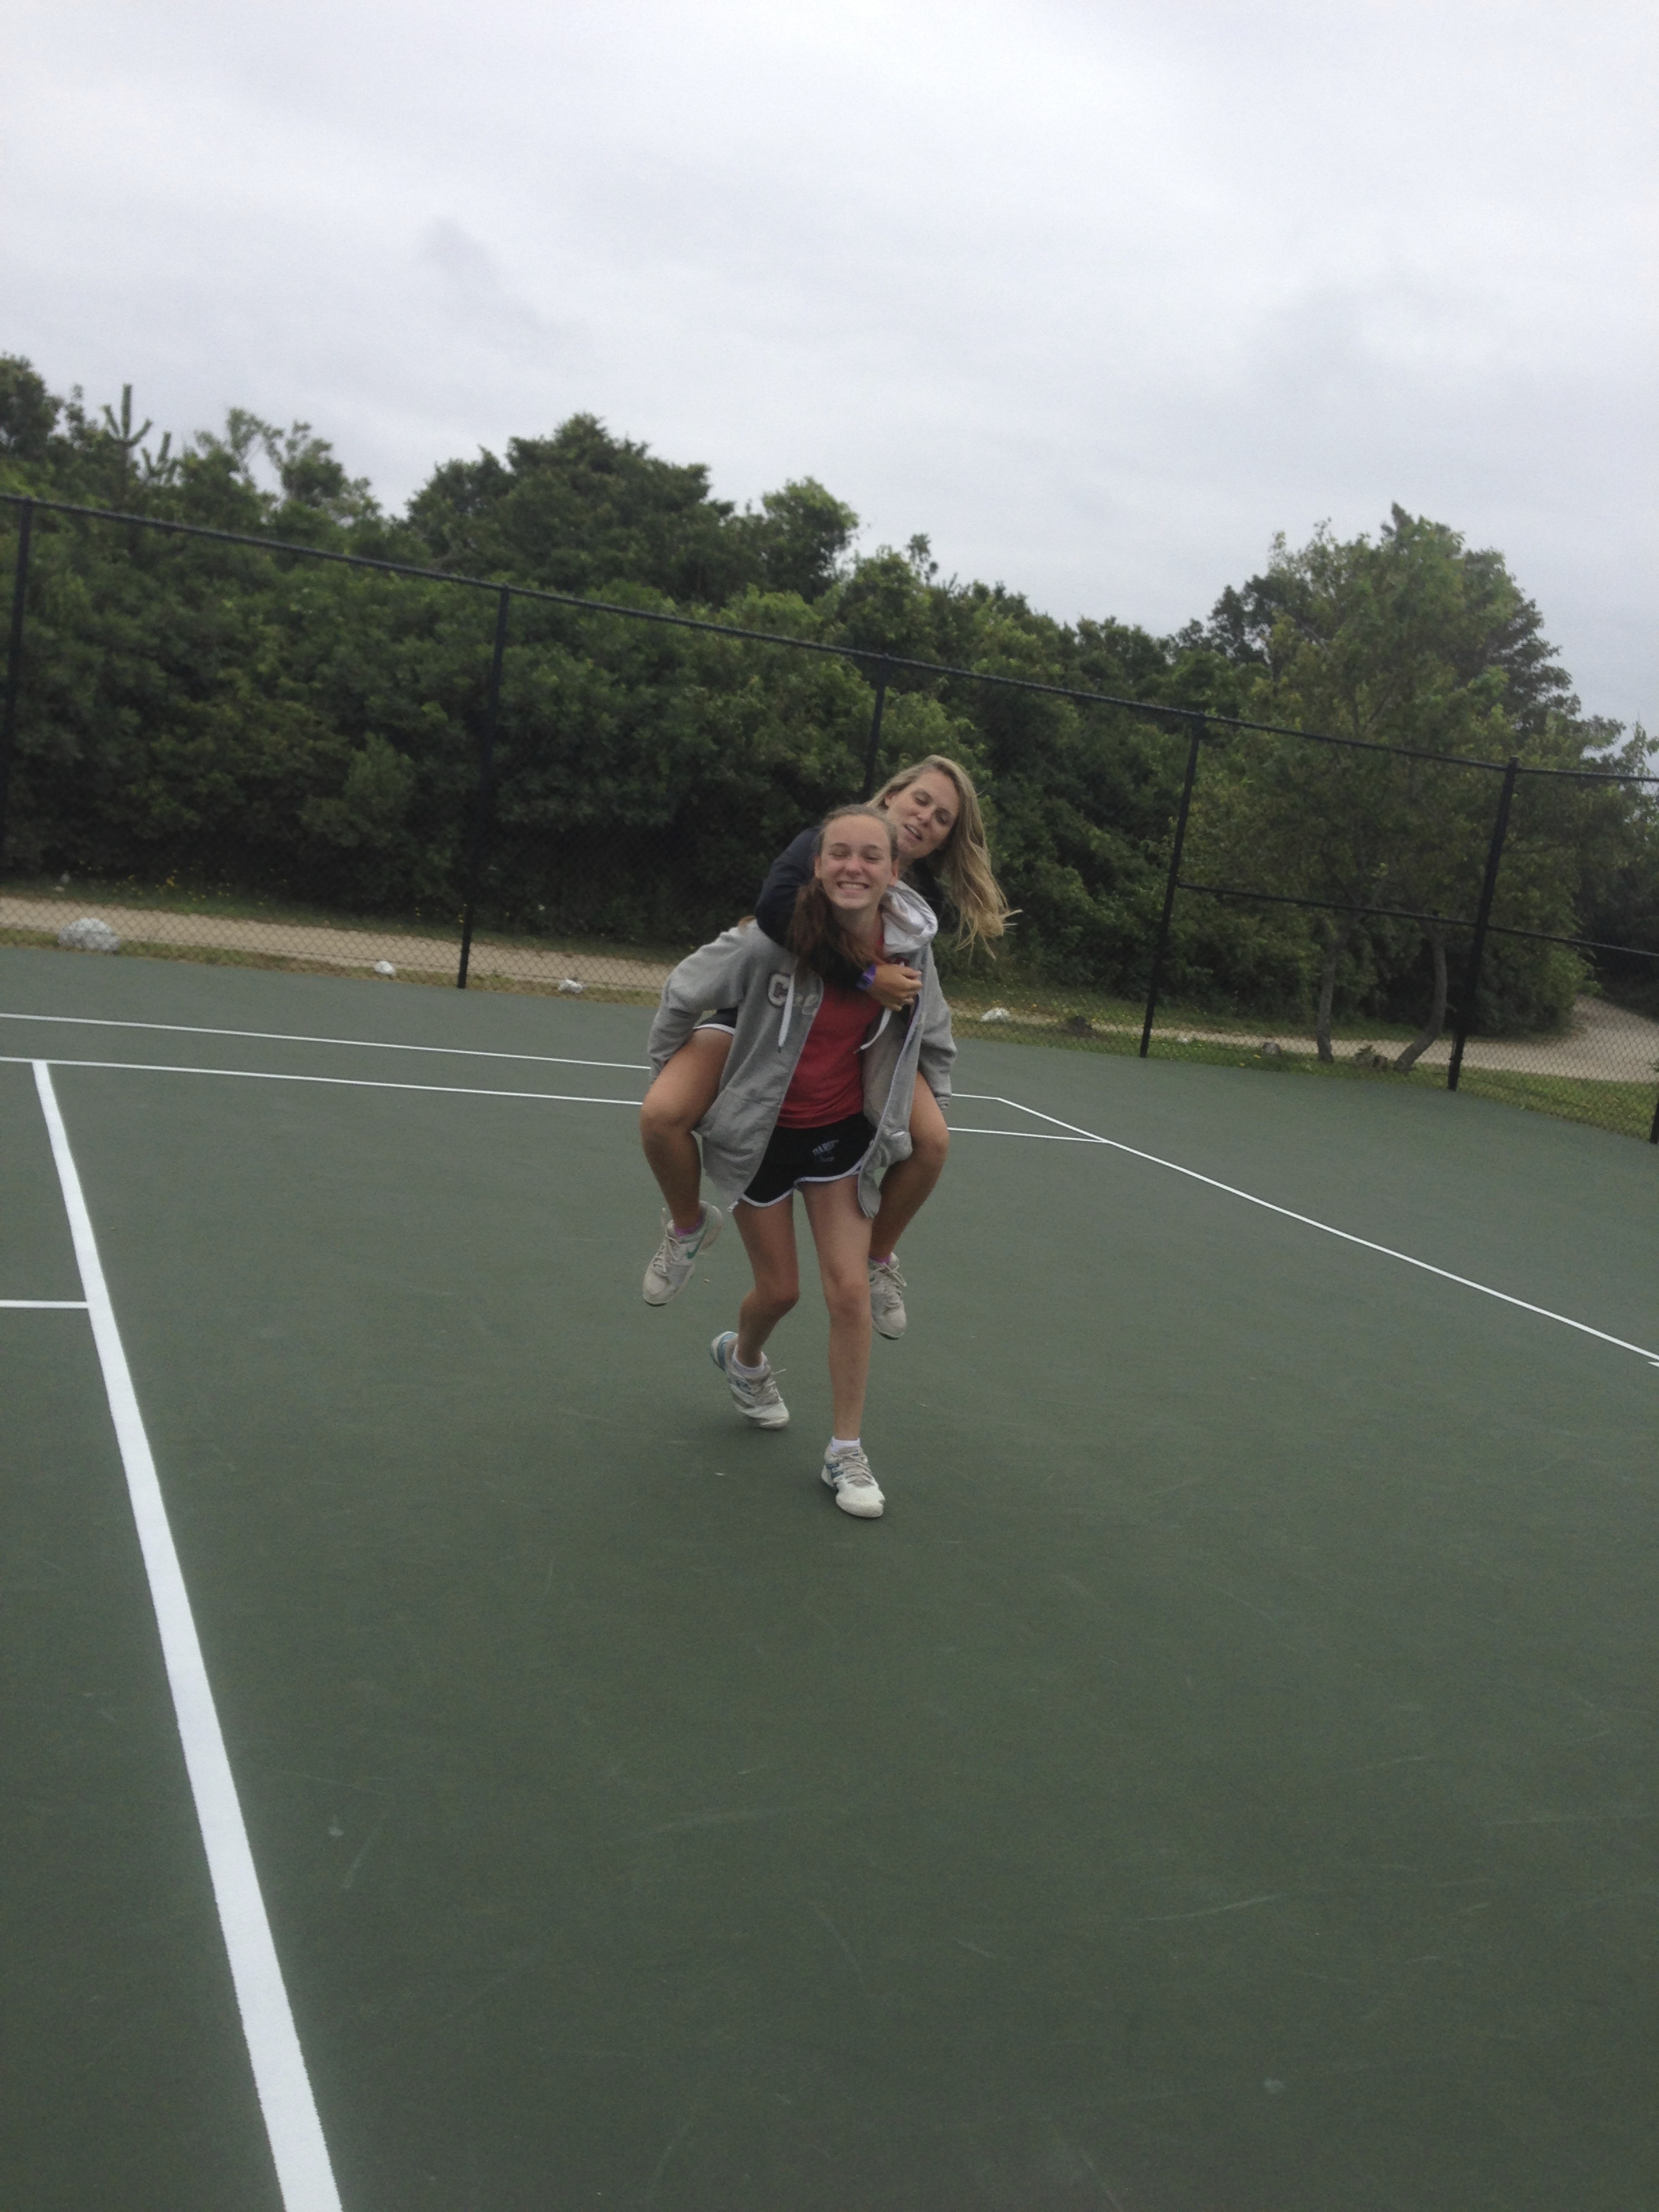 Tennis July 25, 2013